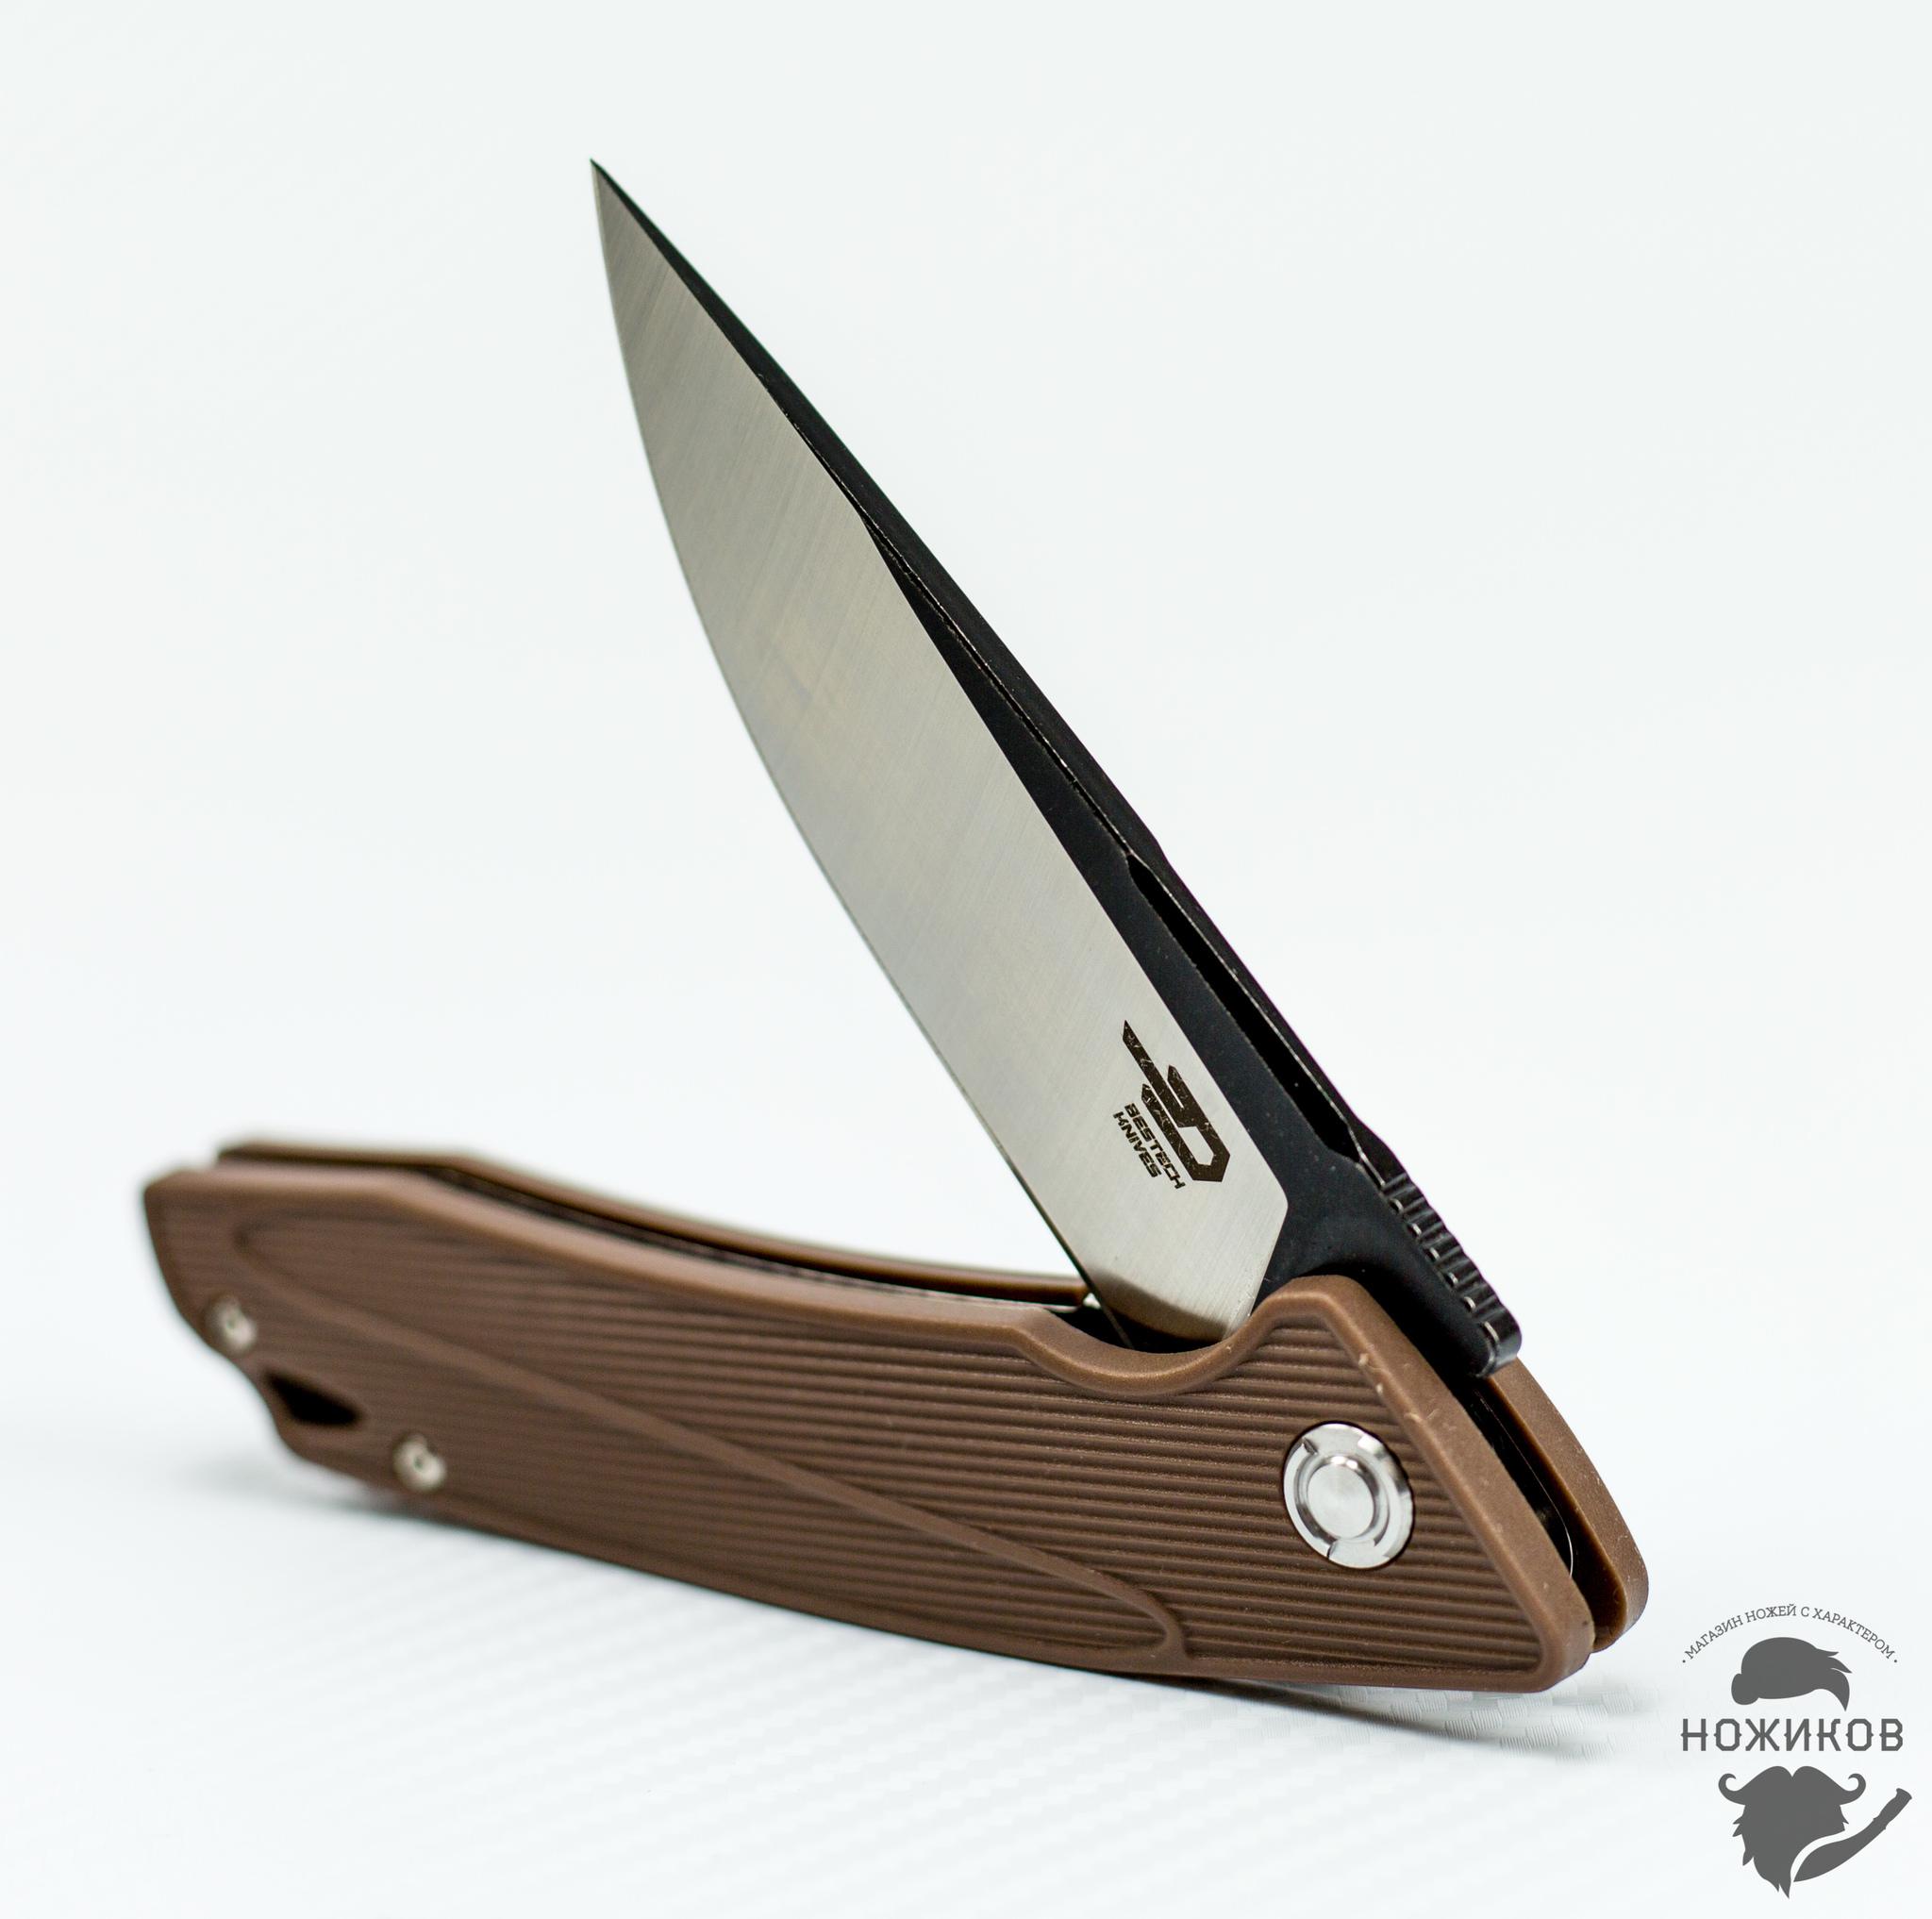 Фото 7 - Складной нож Bestech Spike BG09C-1, сталь Sandvik 12C27 от Bestech Knives